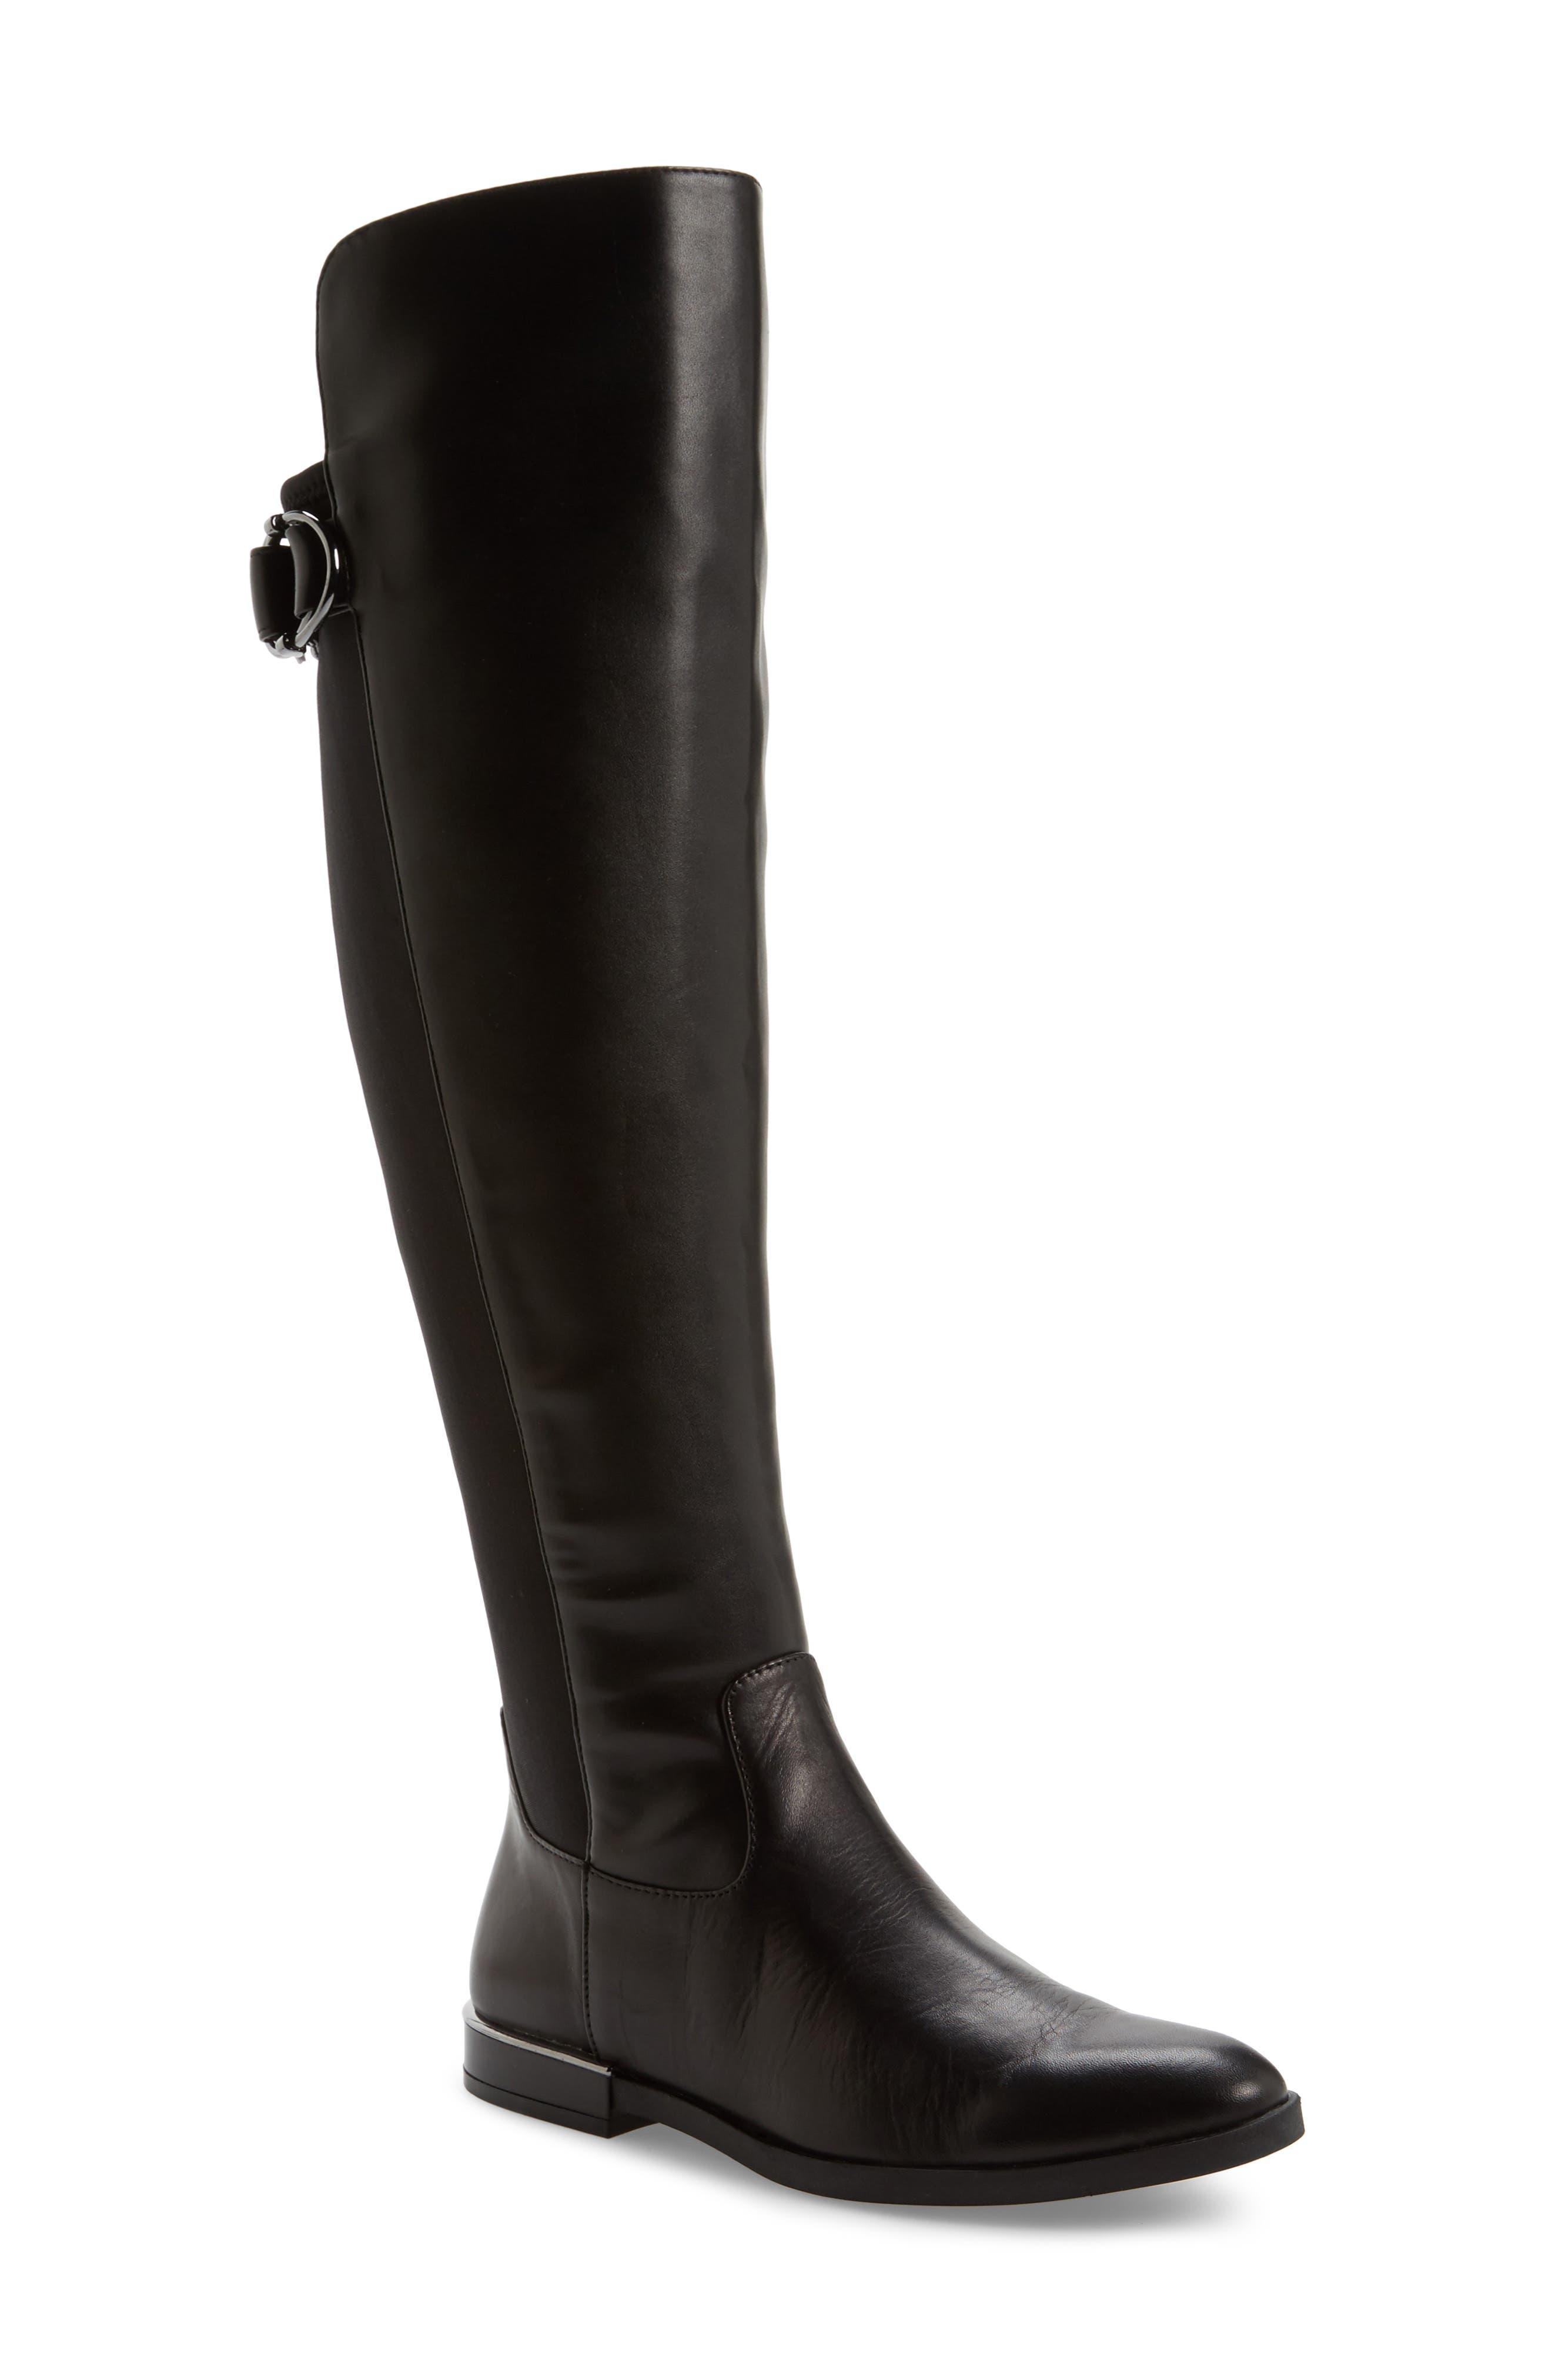 Alternate Image 1 Selected - Calvin Klein Priscila Over the Knee Boot (Women)